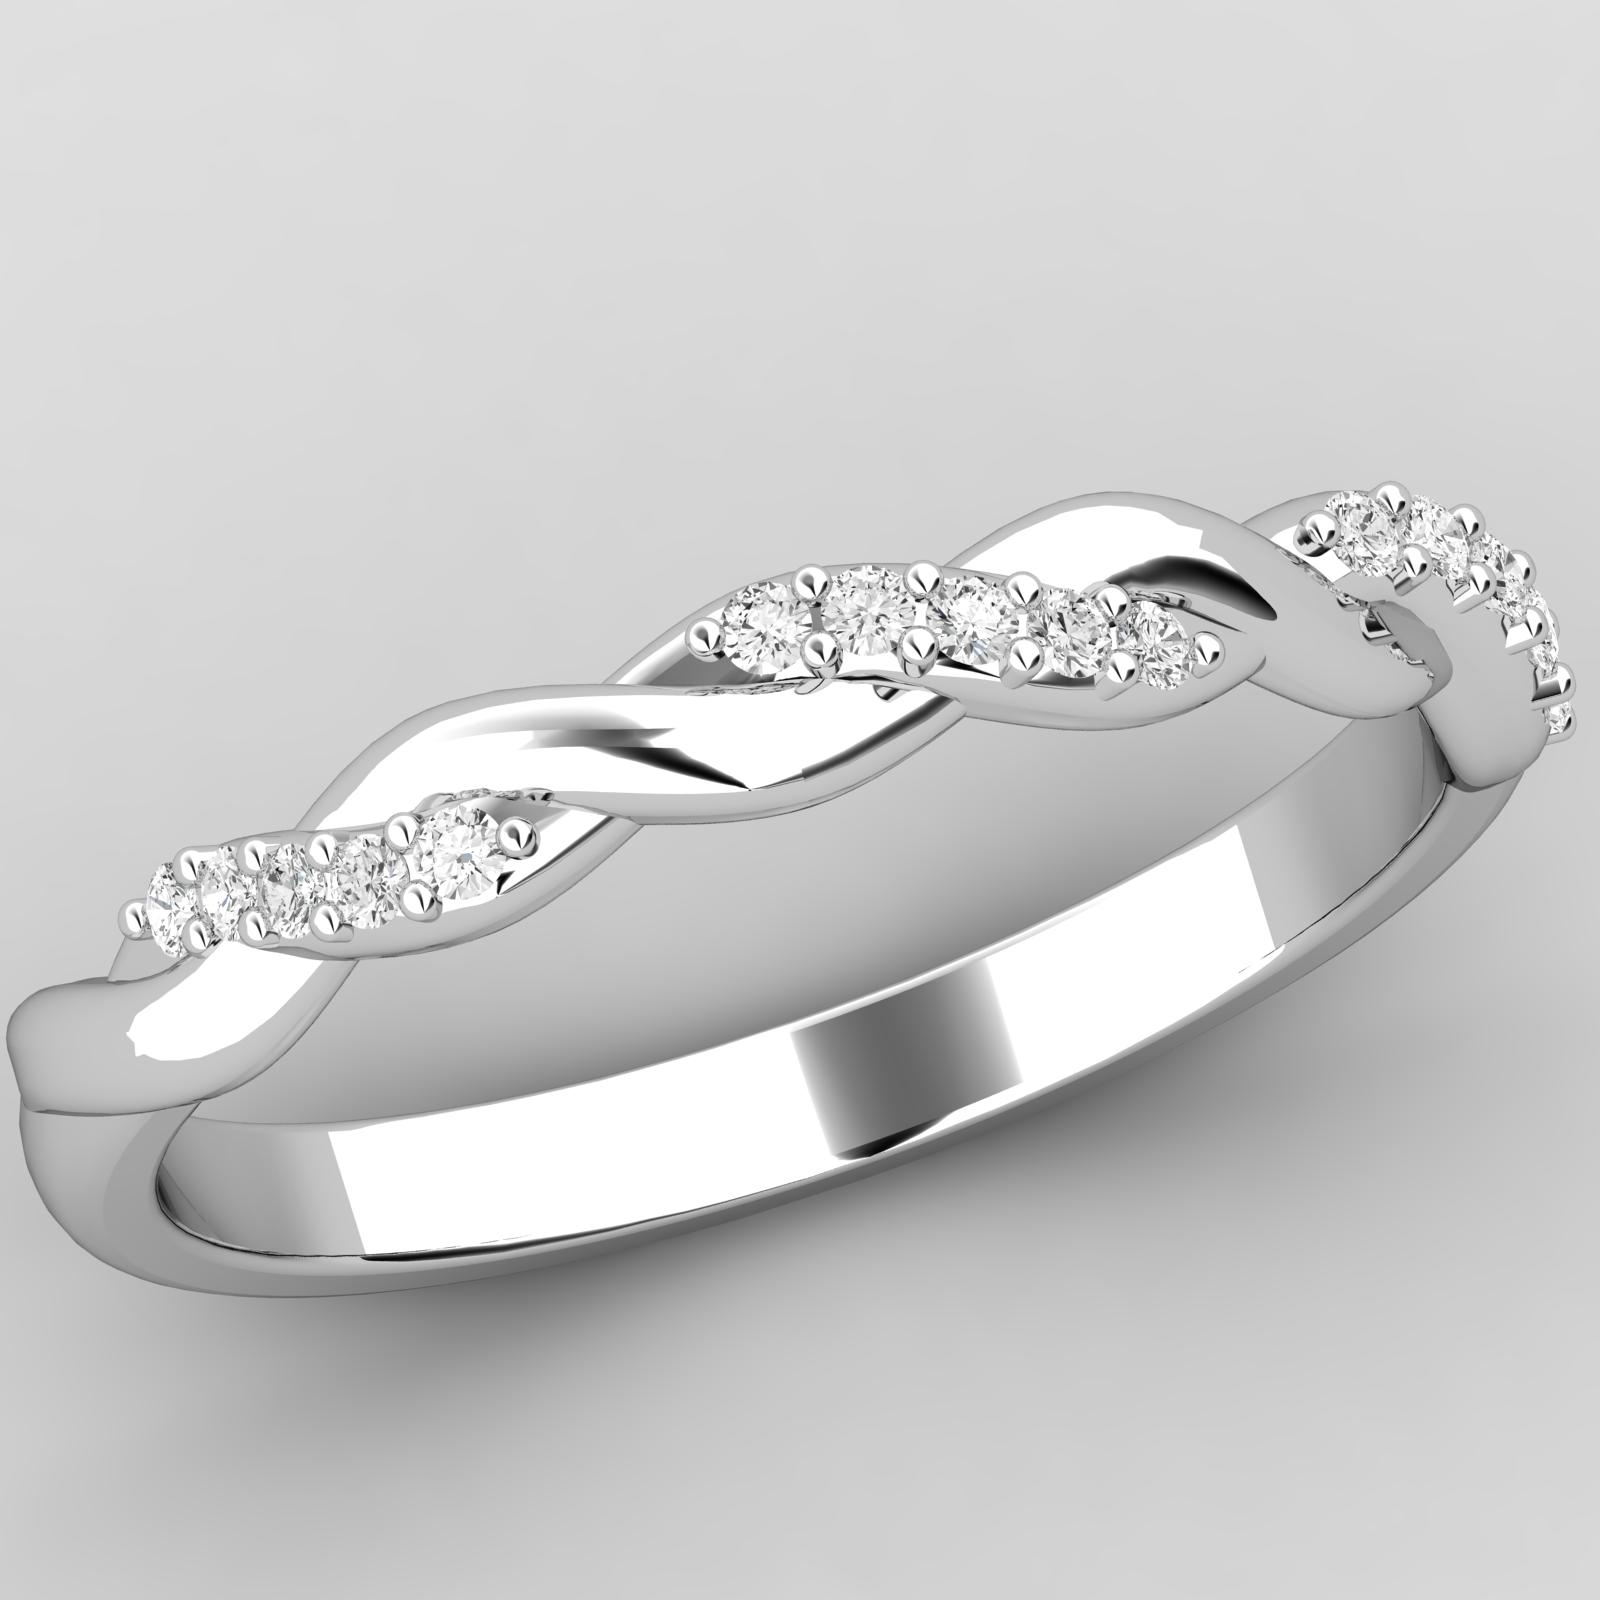 Verigheta Cu Diamant Inel Eternity Dama Platina Cu Briliante